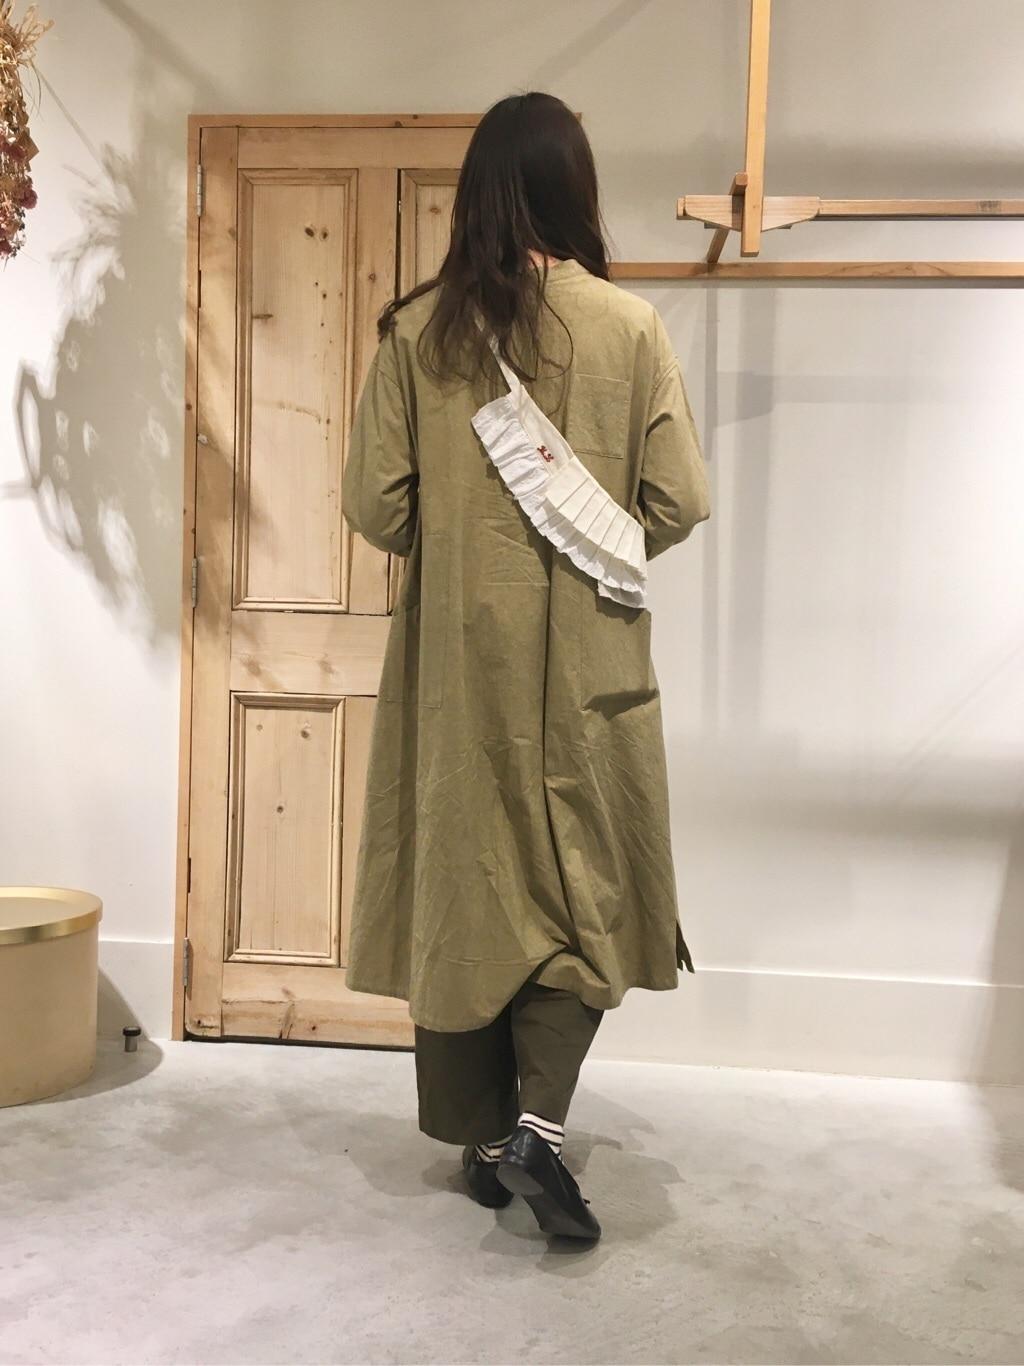 Malle chambre de charme 調布パルコ 身長:167cm 2020.03.01